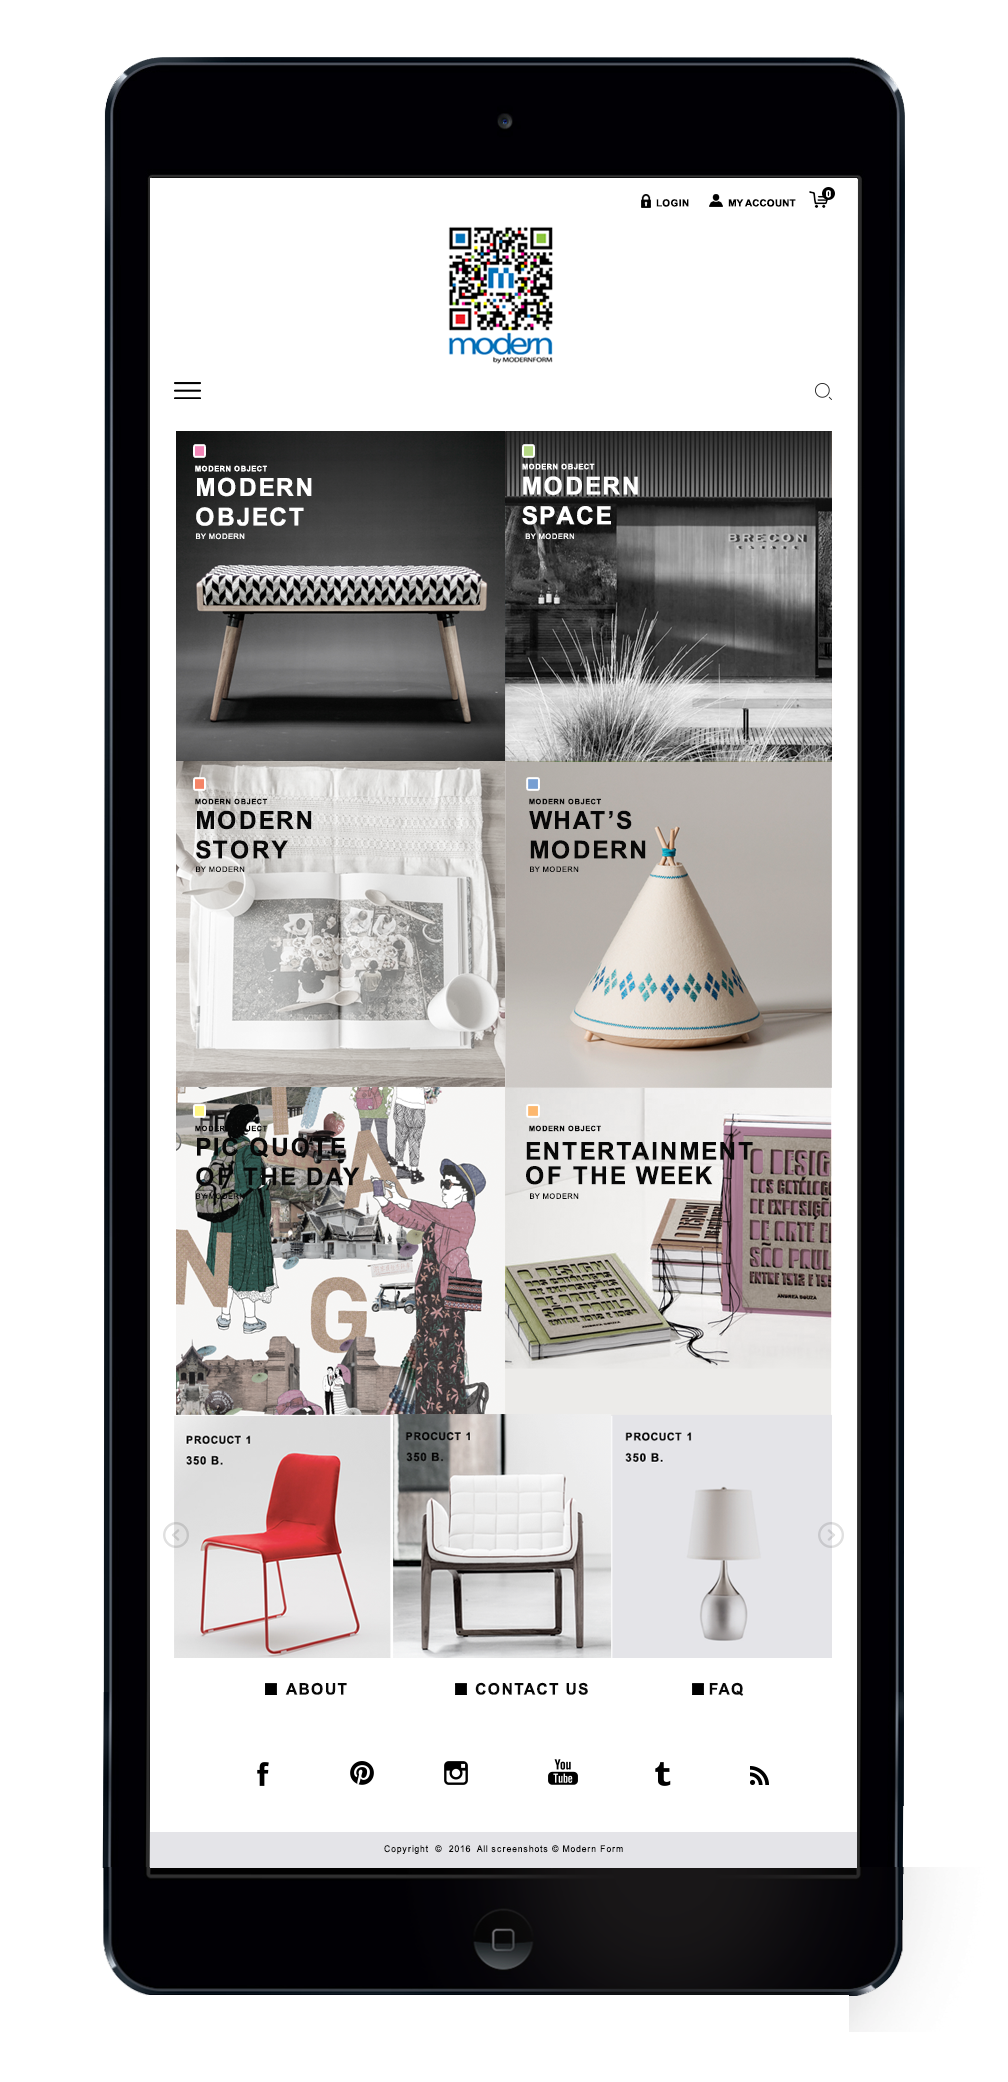 _Modern-Form-iPad